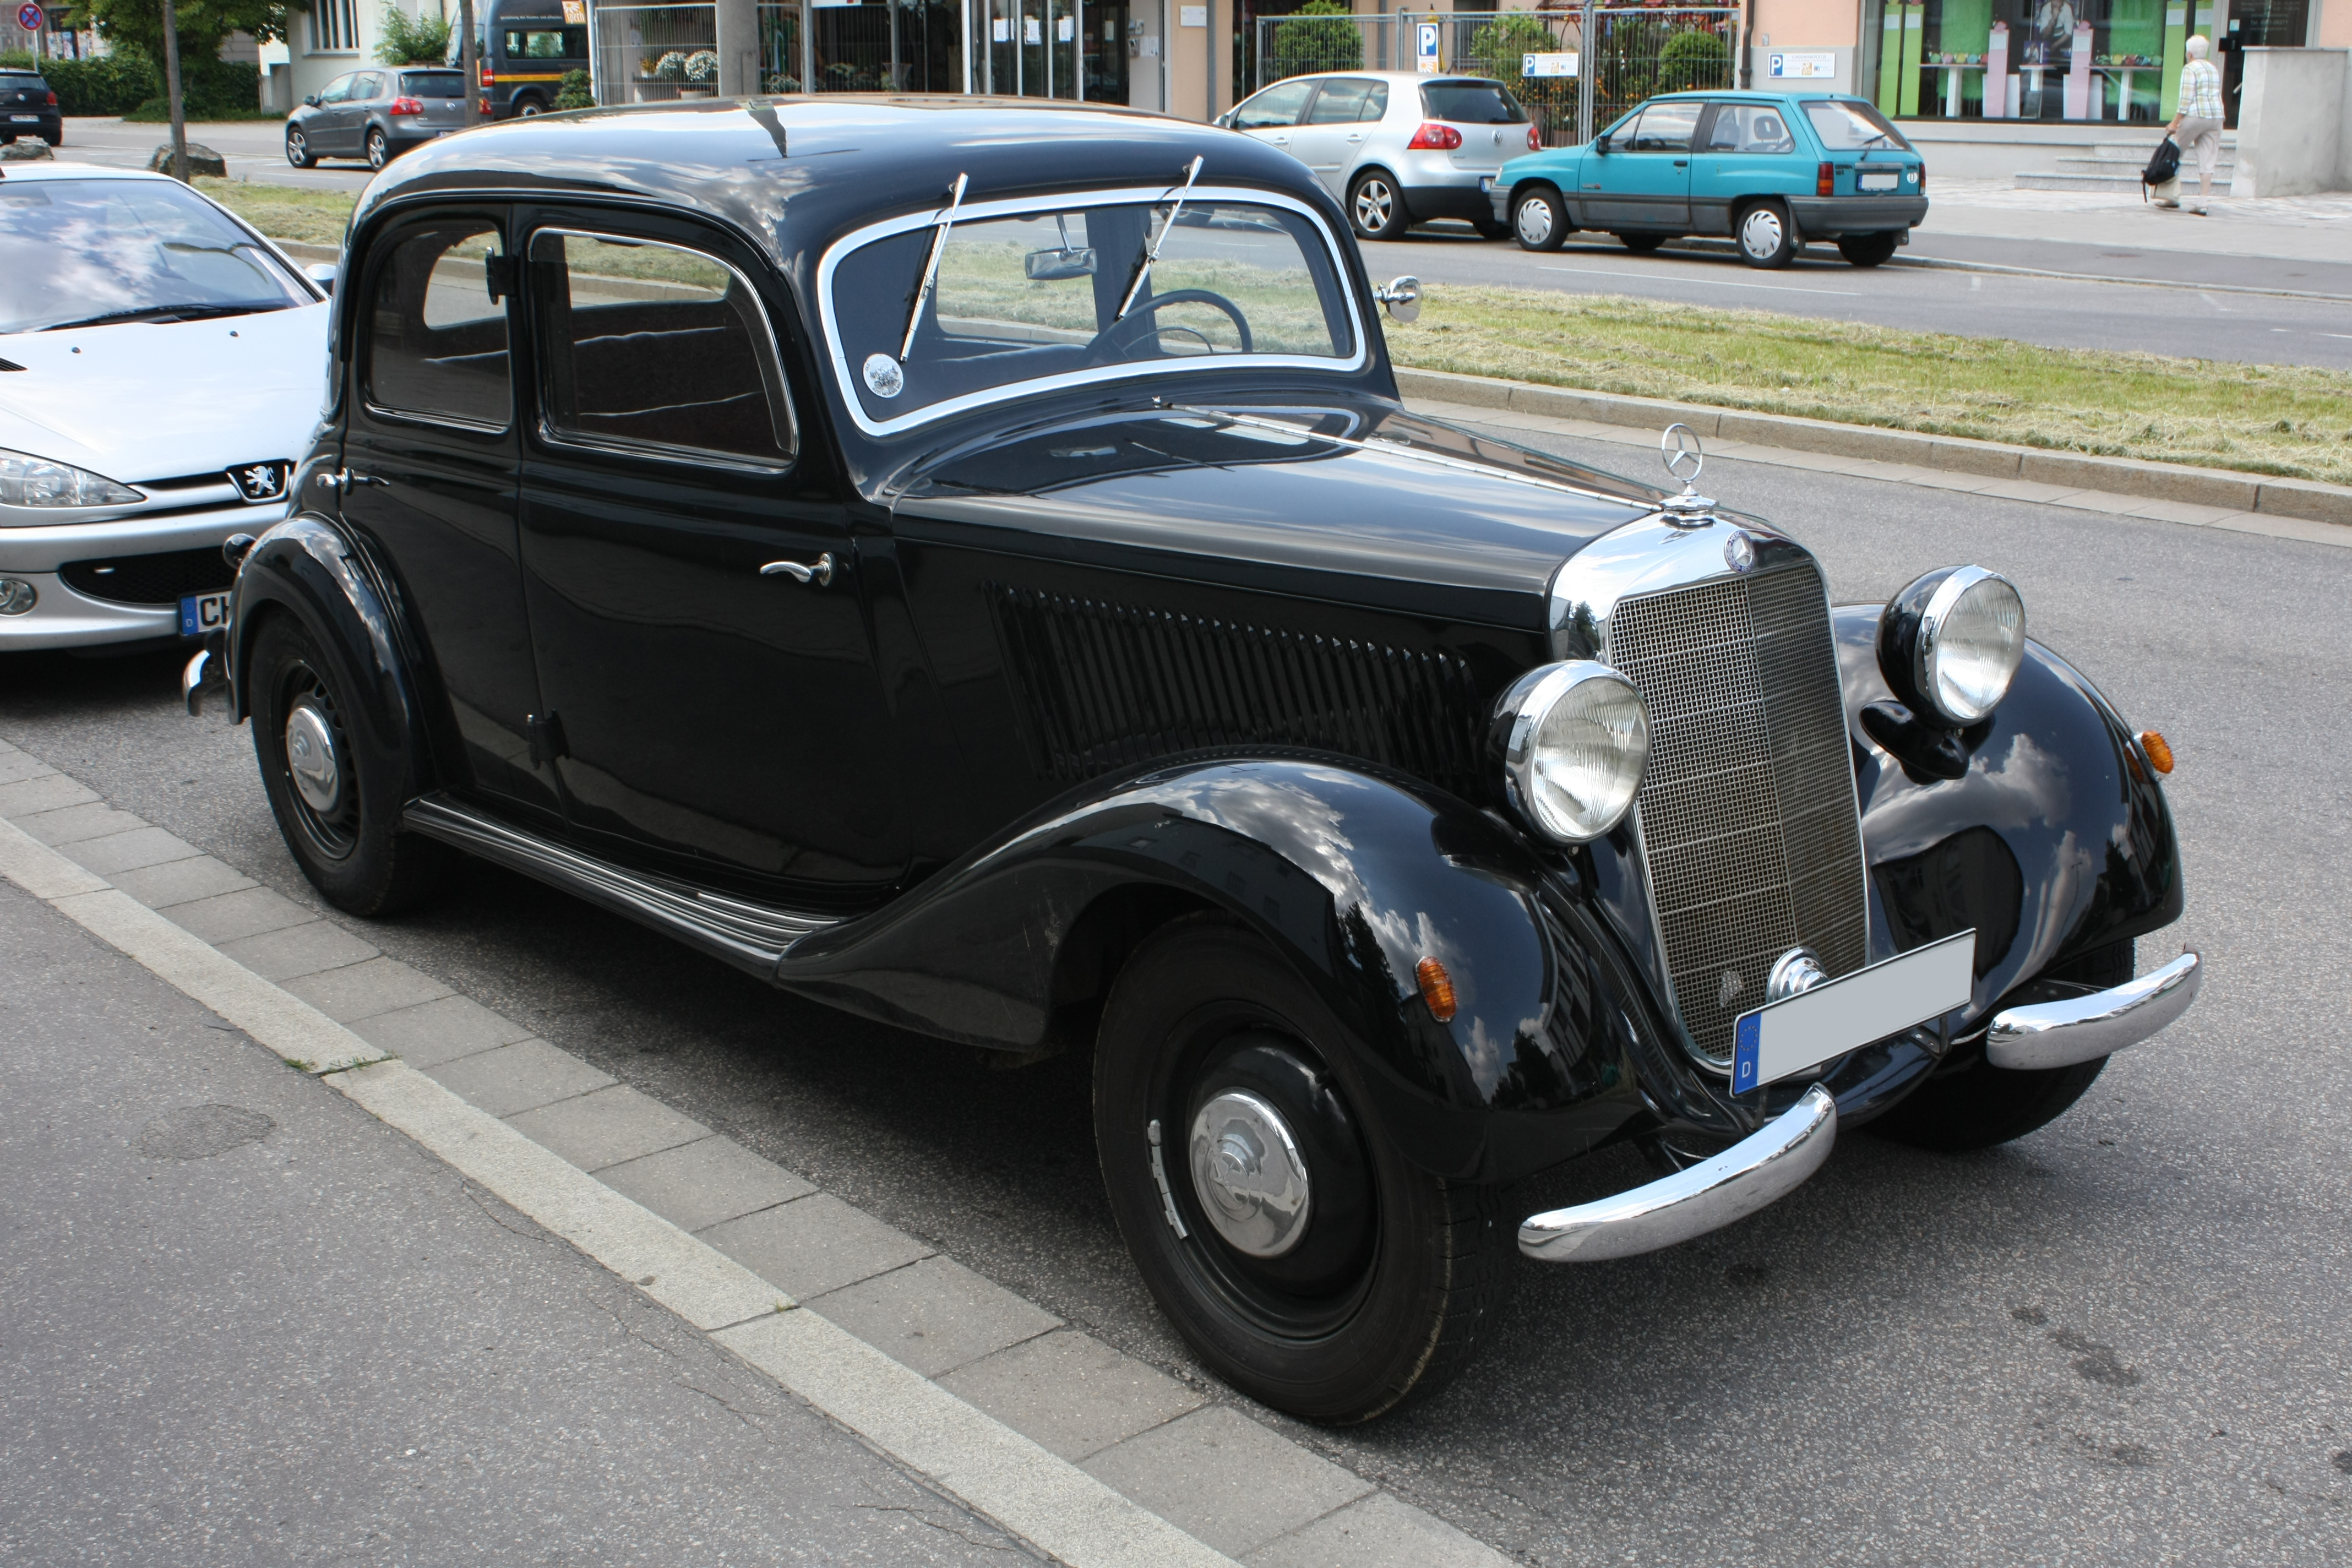 Mercedes Benz Command Qualit Ef Bf Bdt Der Verkehrsdaten